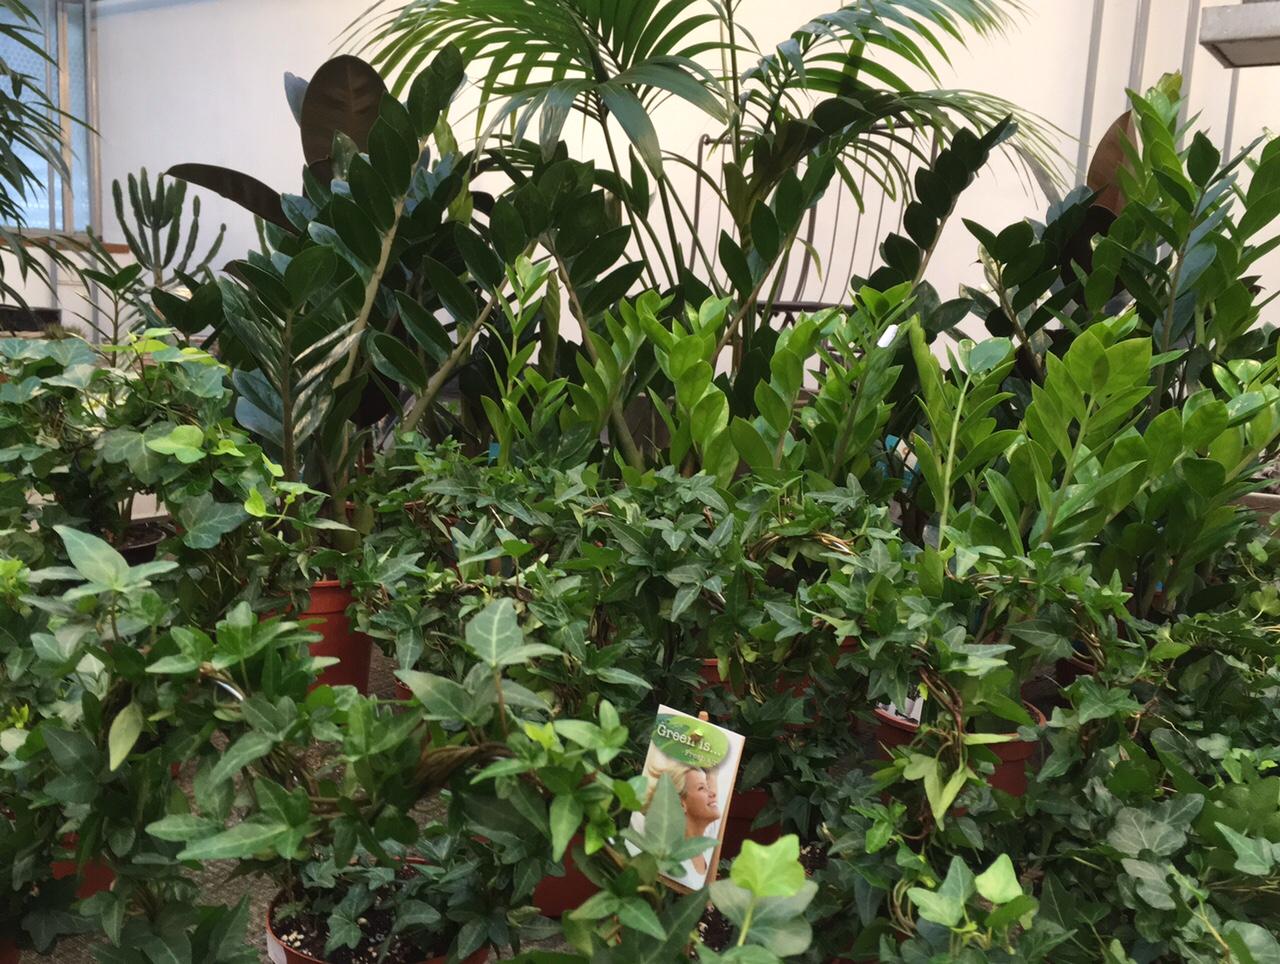 BLUMEN-RAMPP-Pflanzen-grün